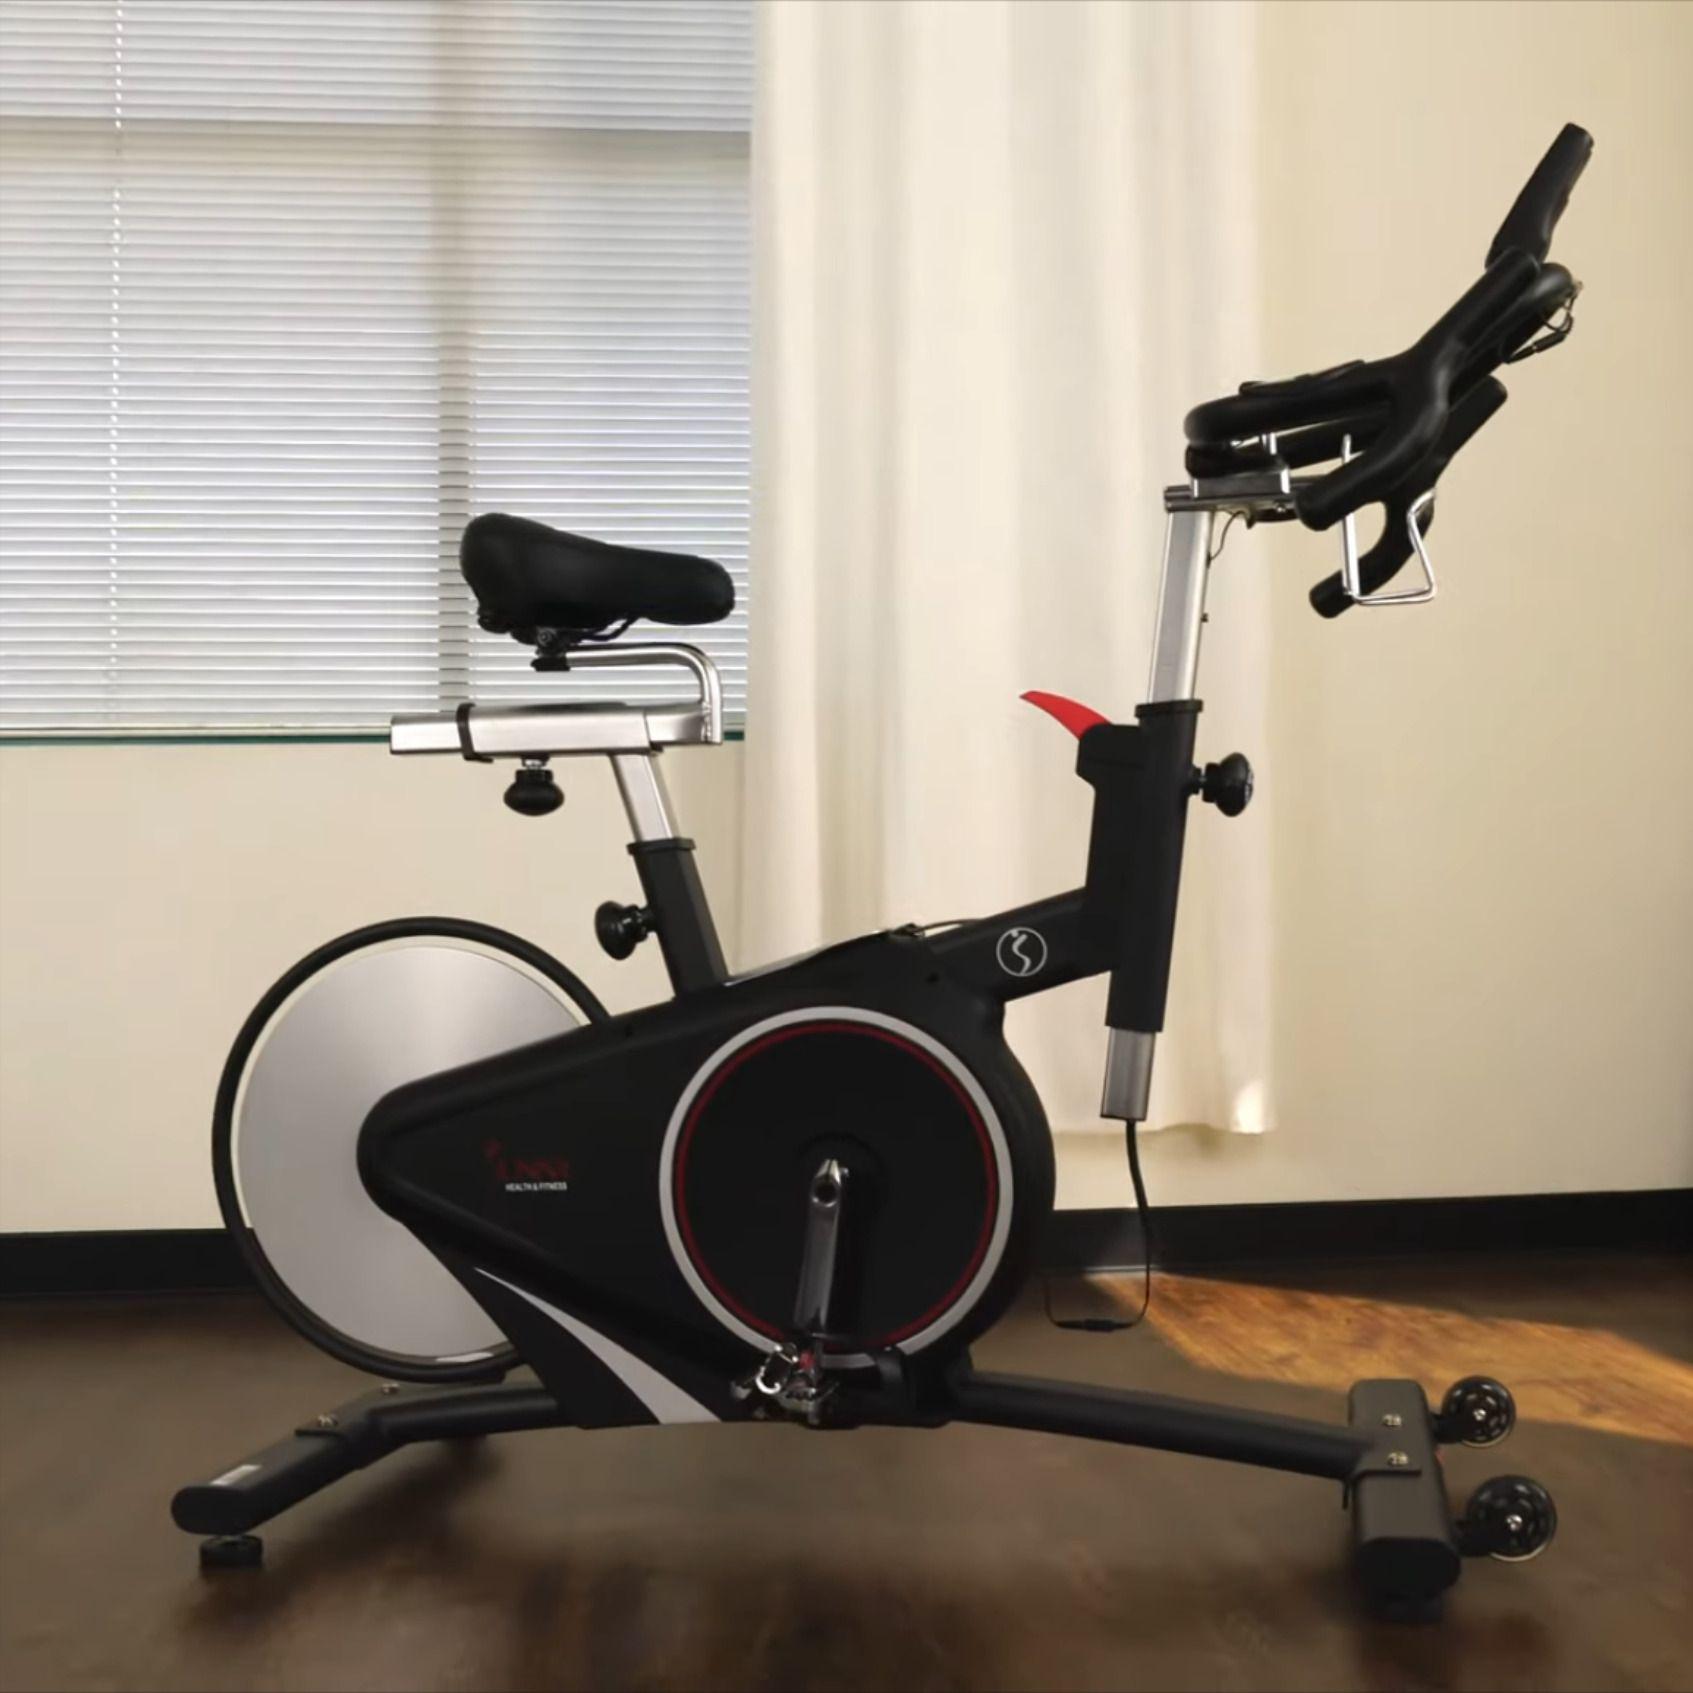 sunny health and fitness elliptical bike